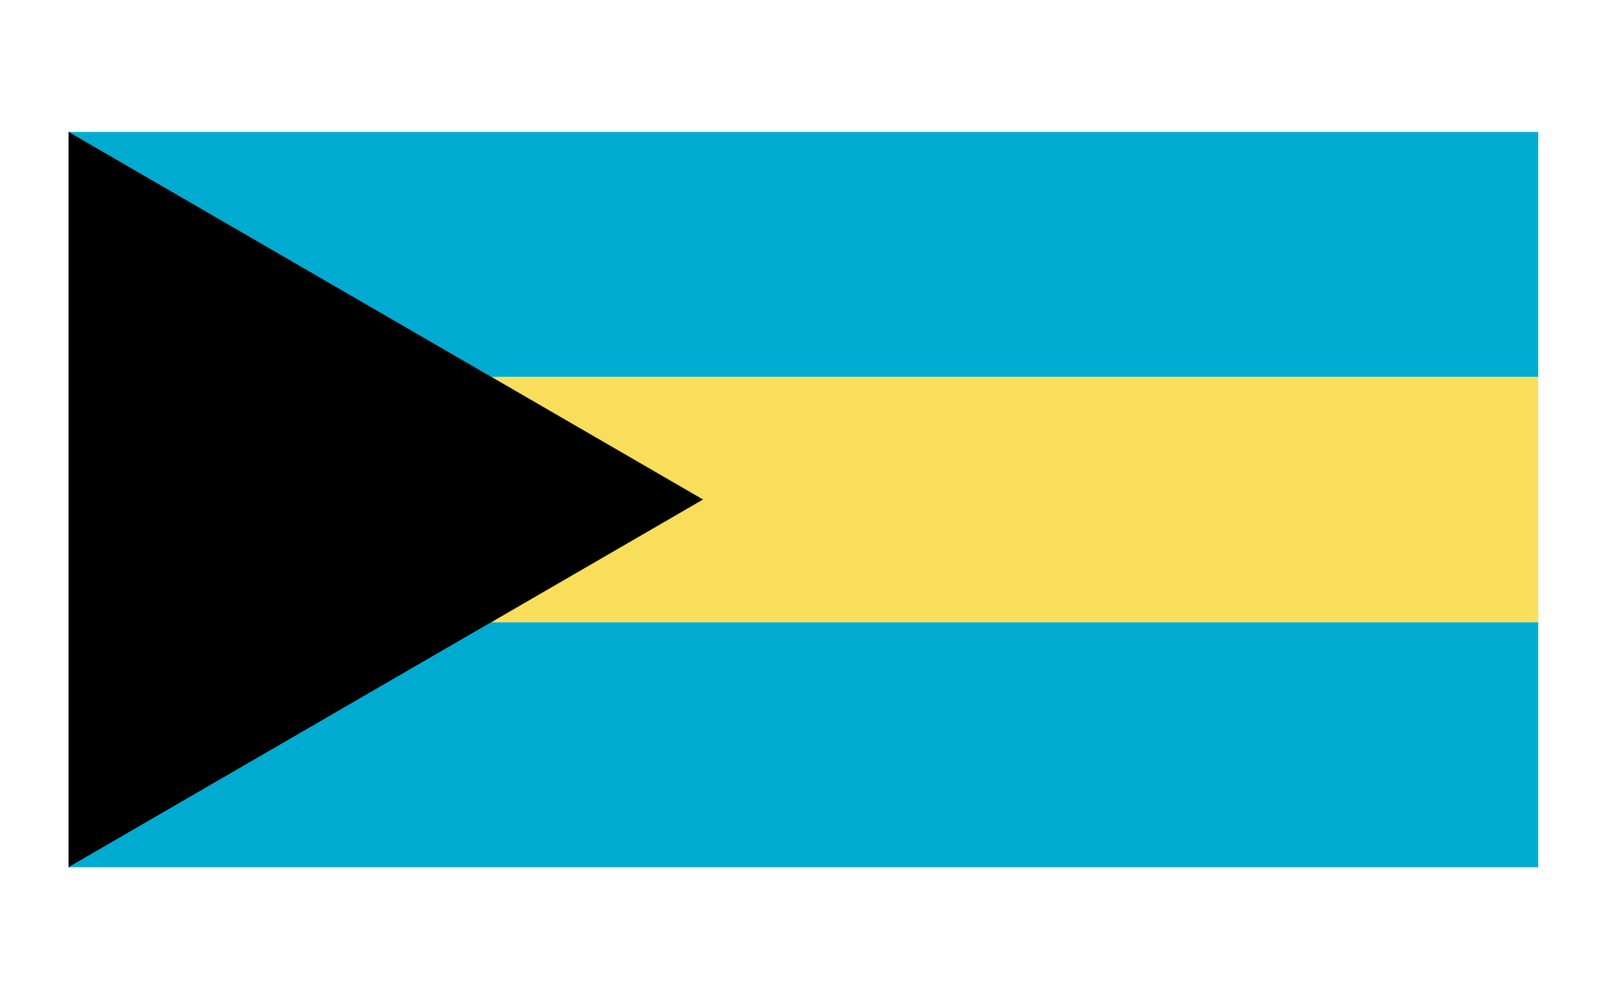 https://3.bp.blogspot.com/-iXokWaeNg8M/TvSaSvvrPBI/AAAAAAAAAZY/sPgZ7ZYp7Y8/s1600/Bahamas.png